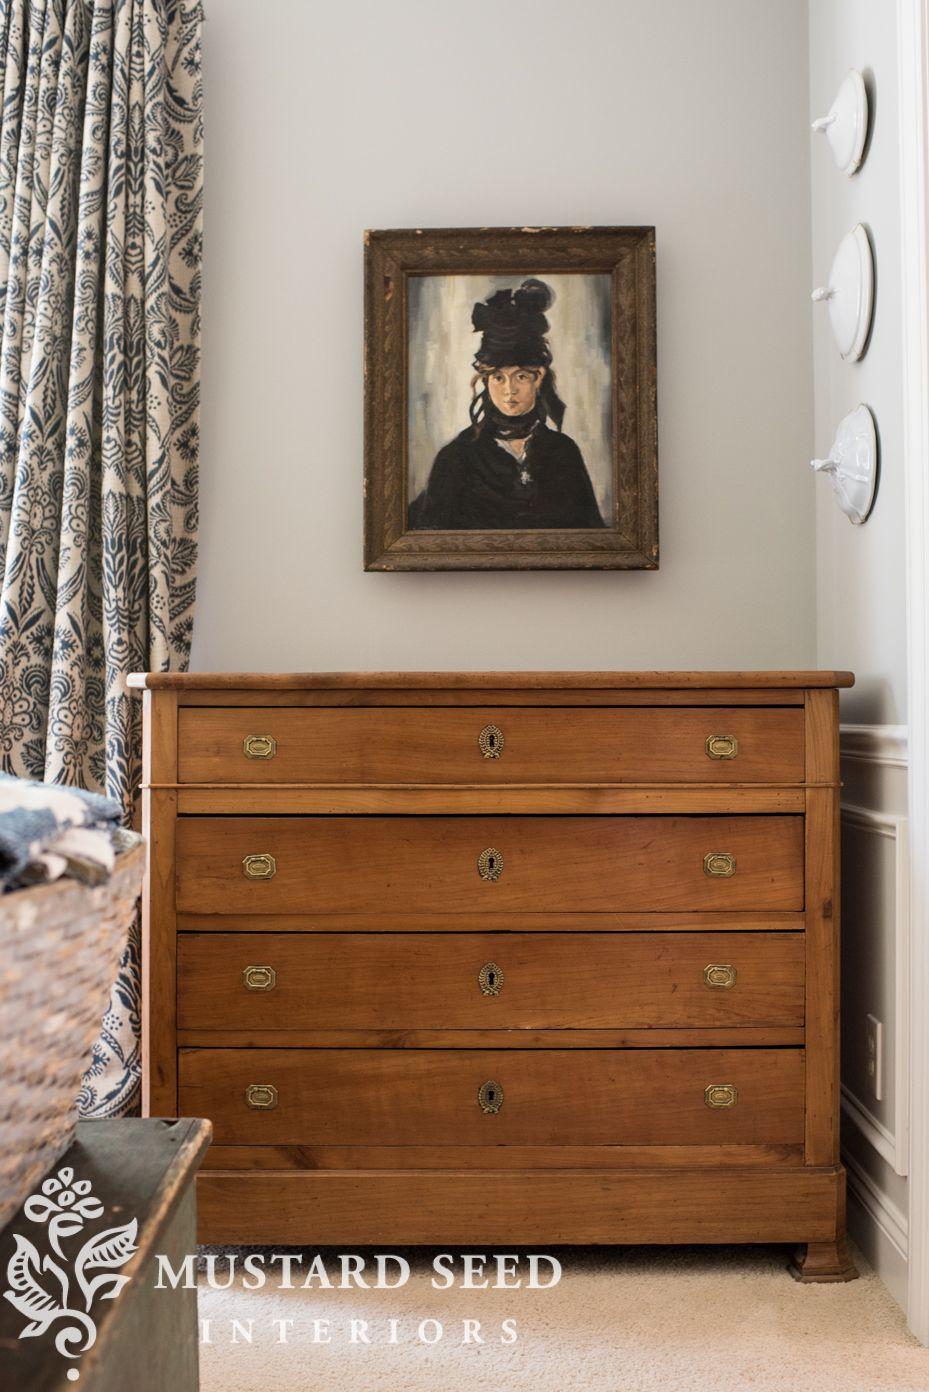 Blame The Used Furniture Furniture Bush Furniture Wooden Dresser